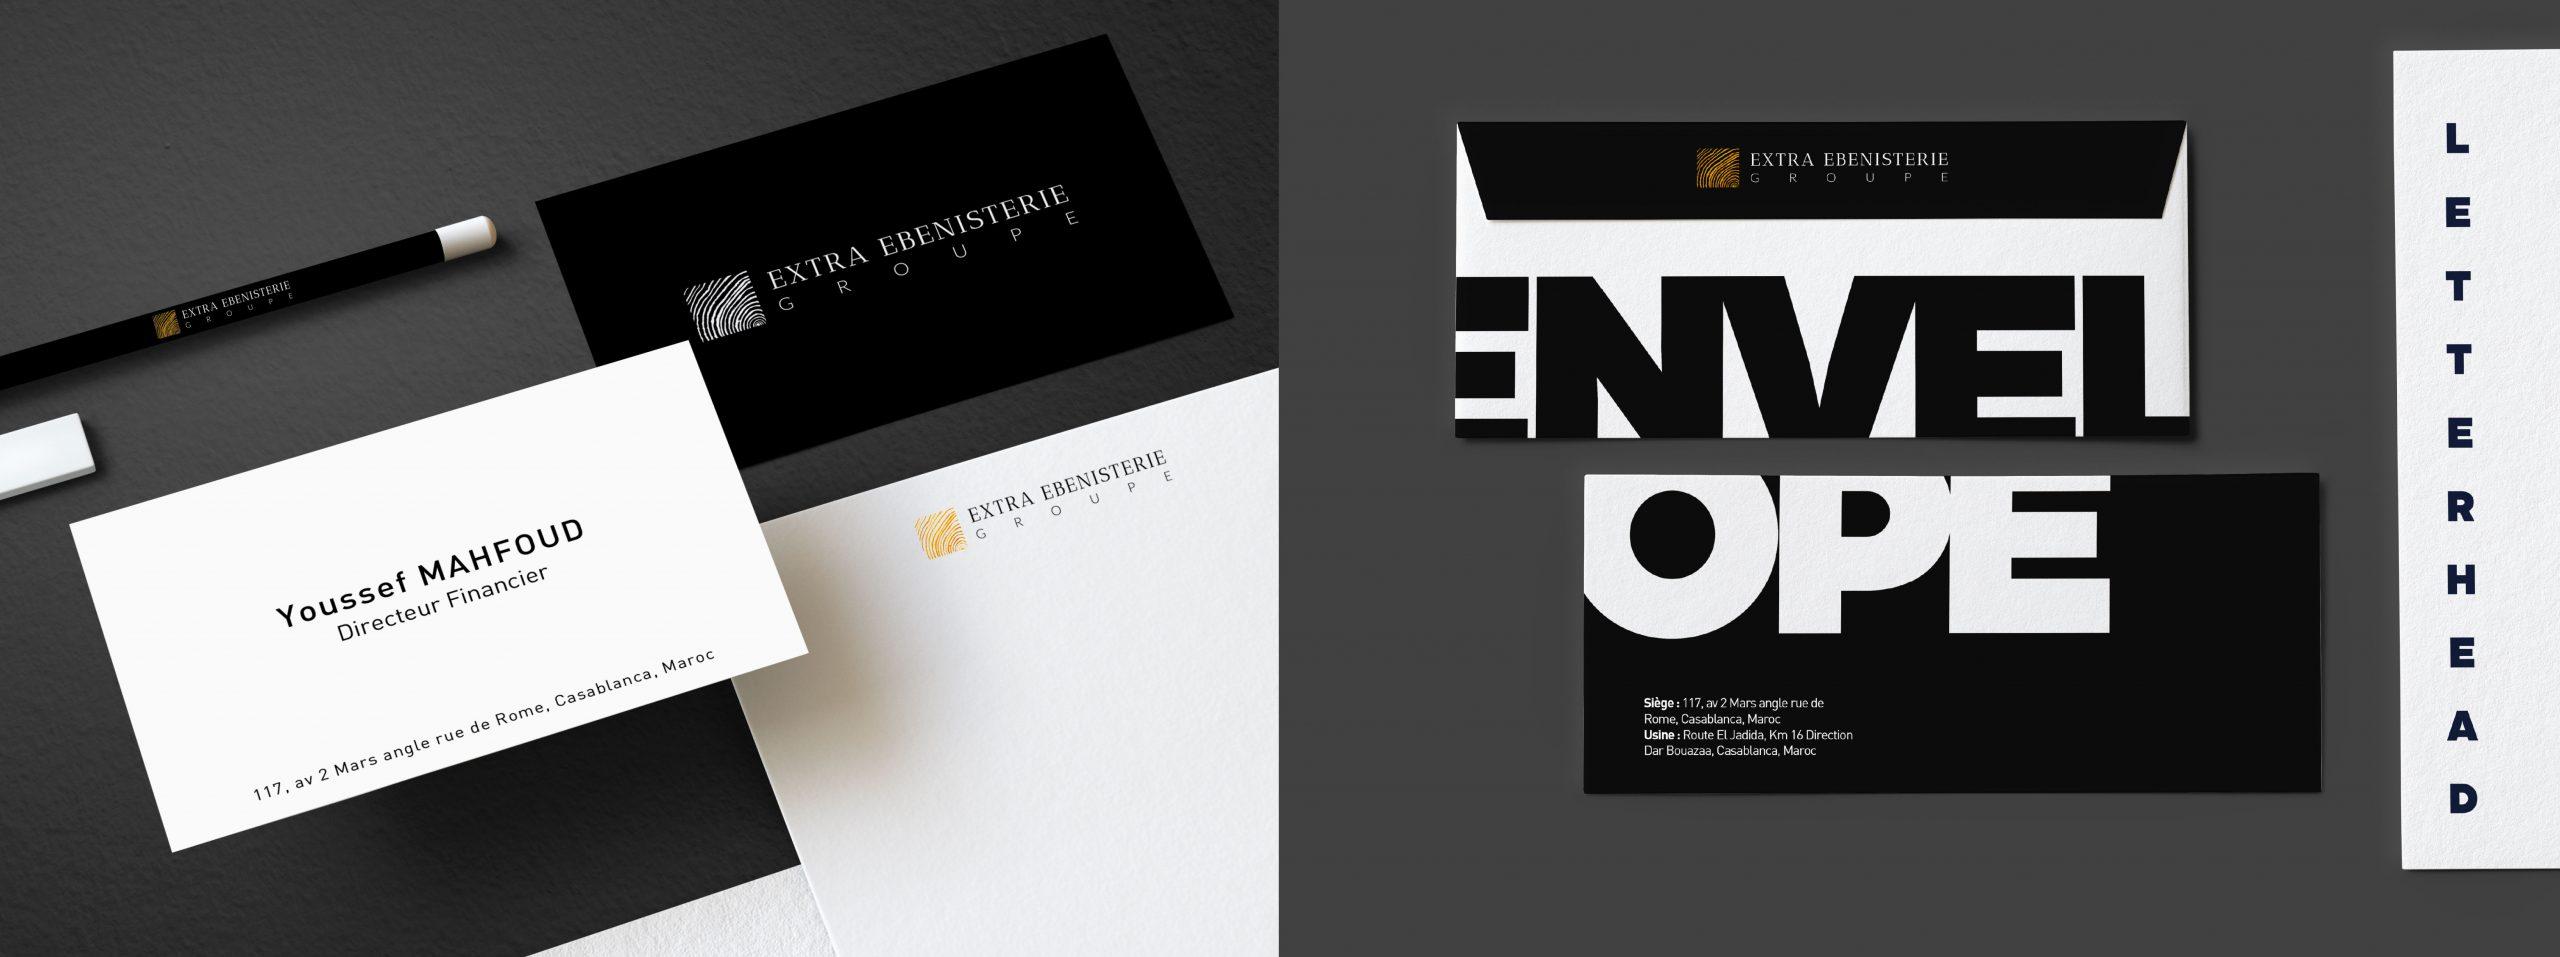 Extra-Ebenisterie-logo